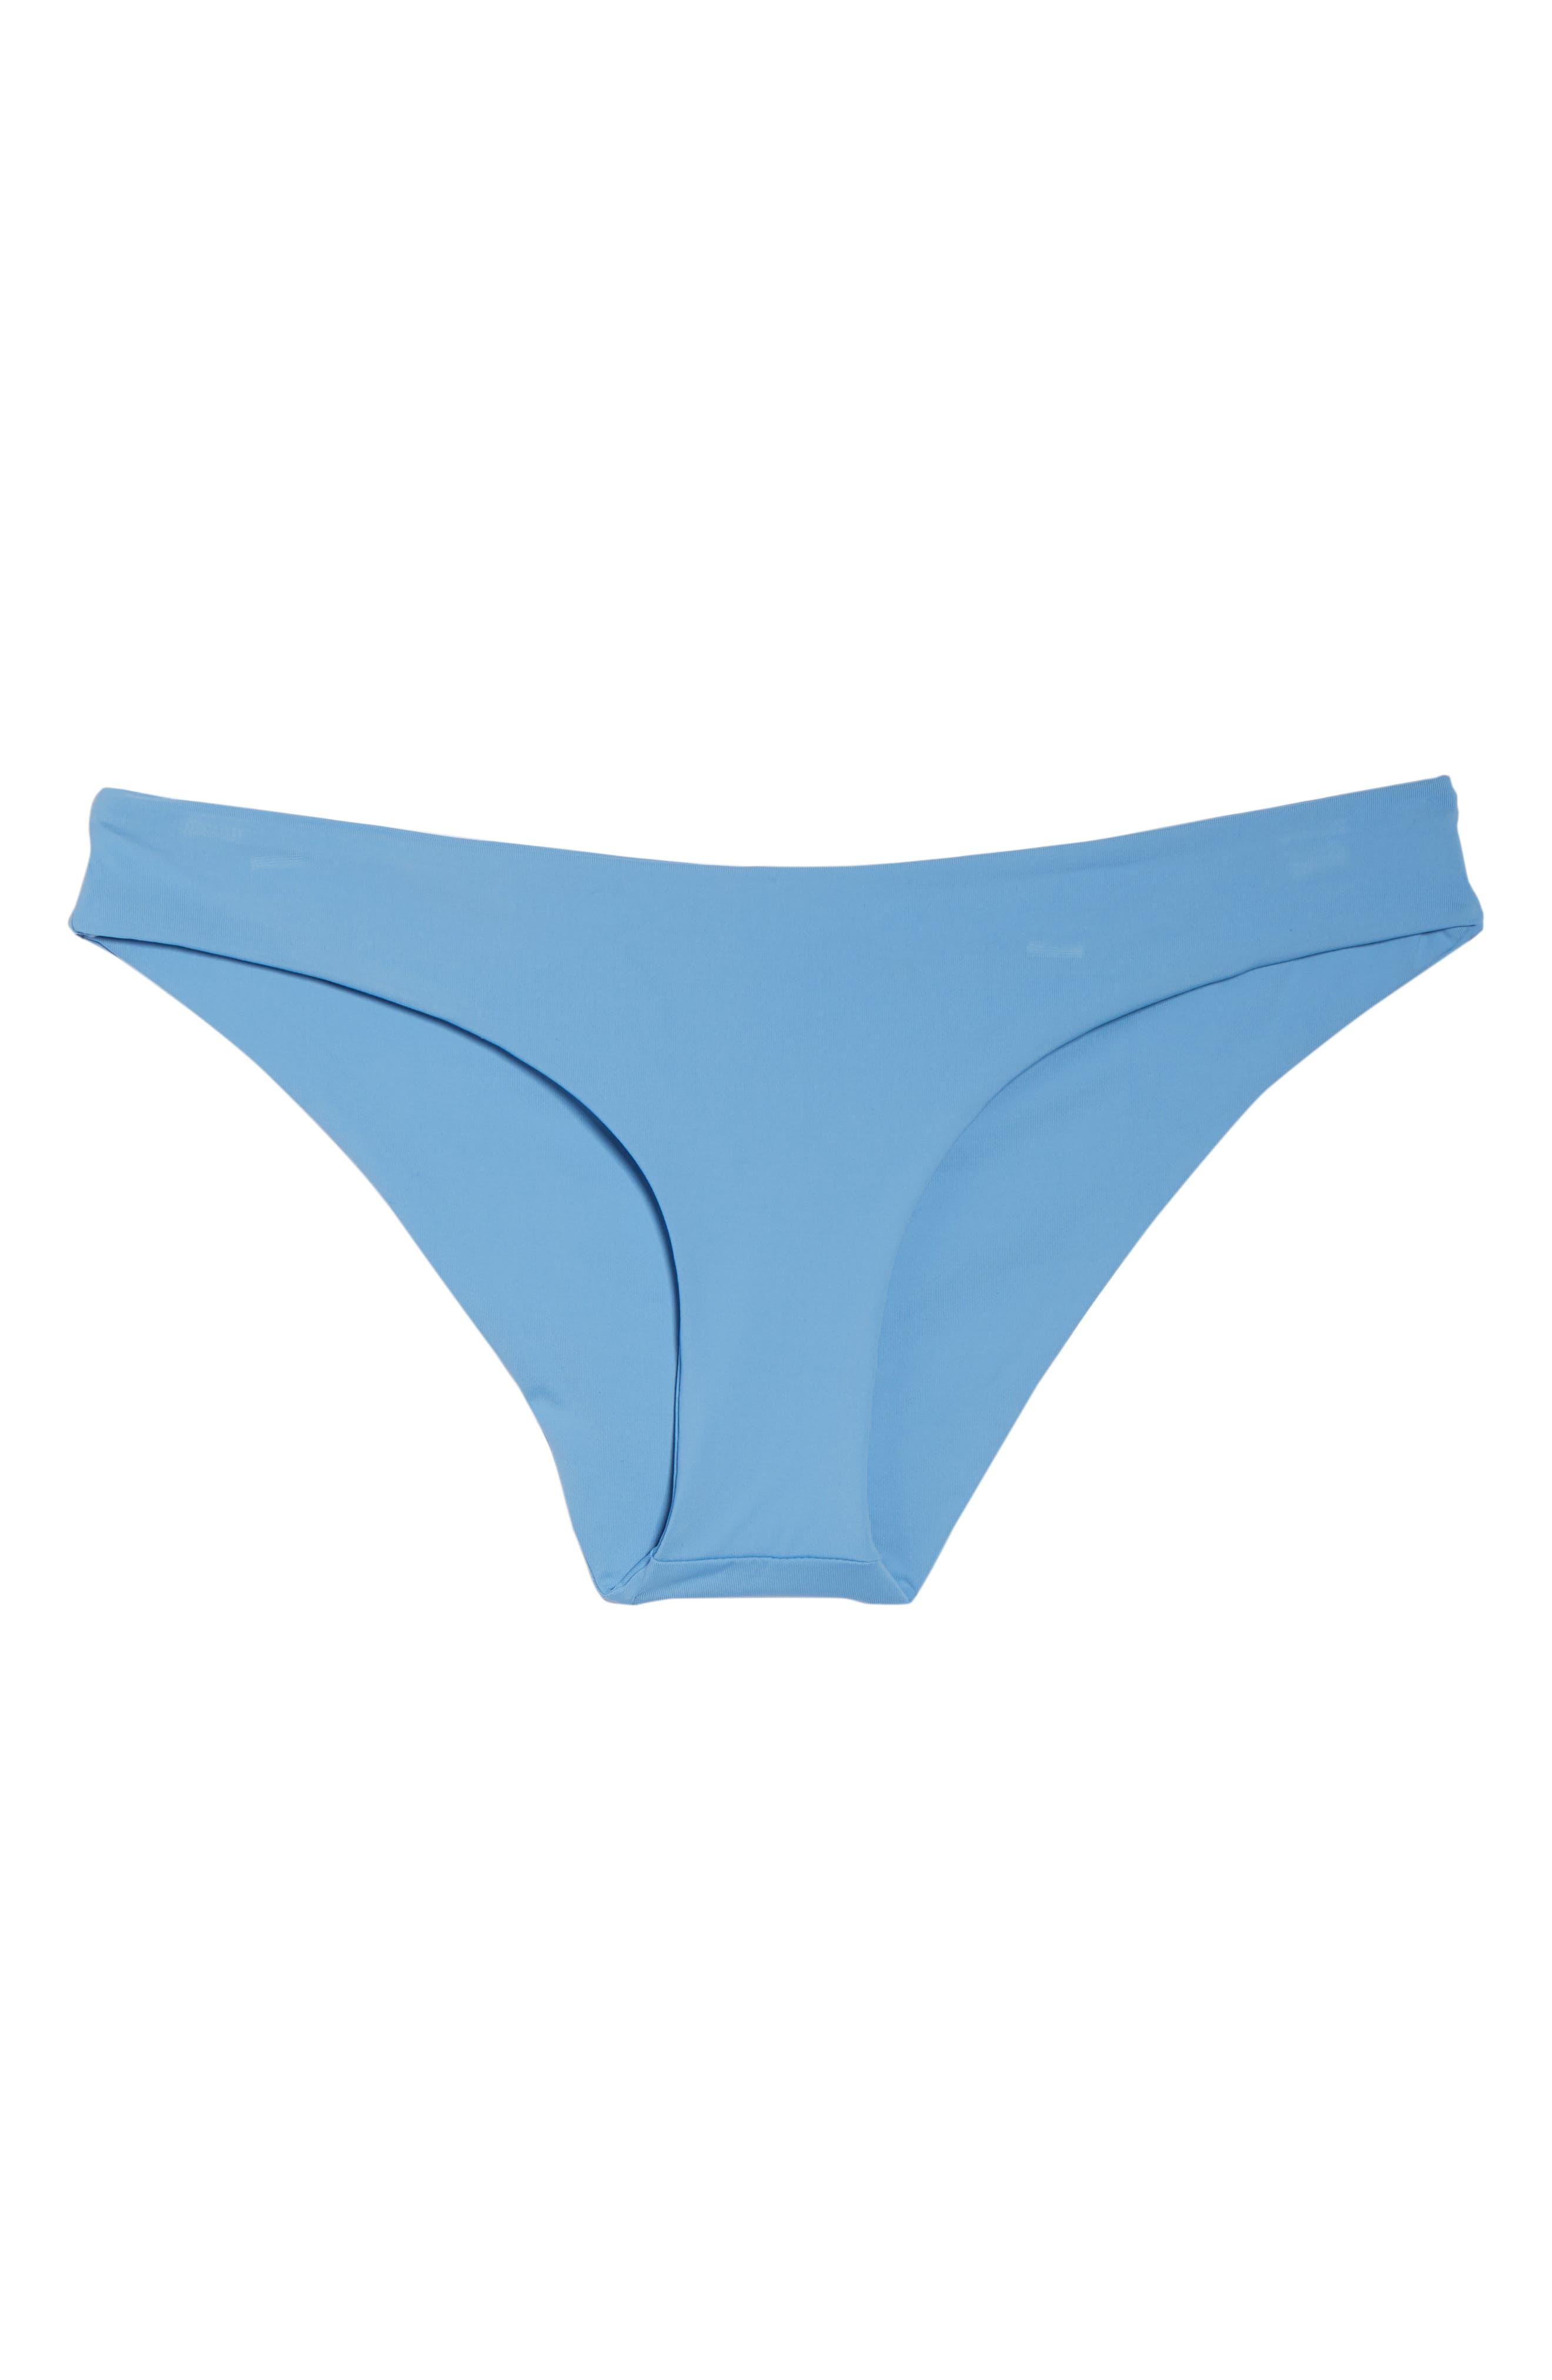 Sandy Classic Bikini Bottoms,                             Alternate thumbnail 9, color,                             Ocean